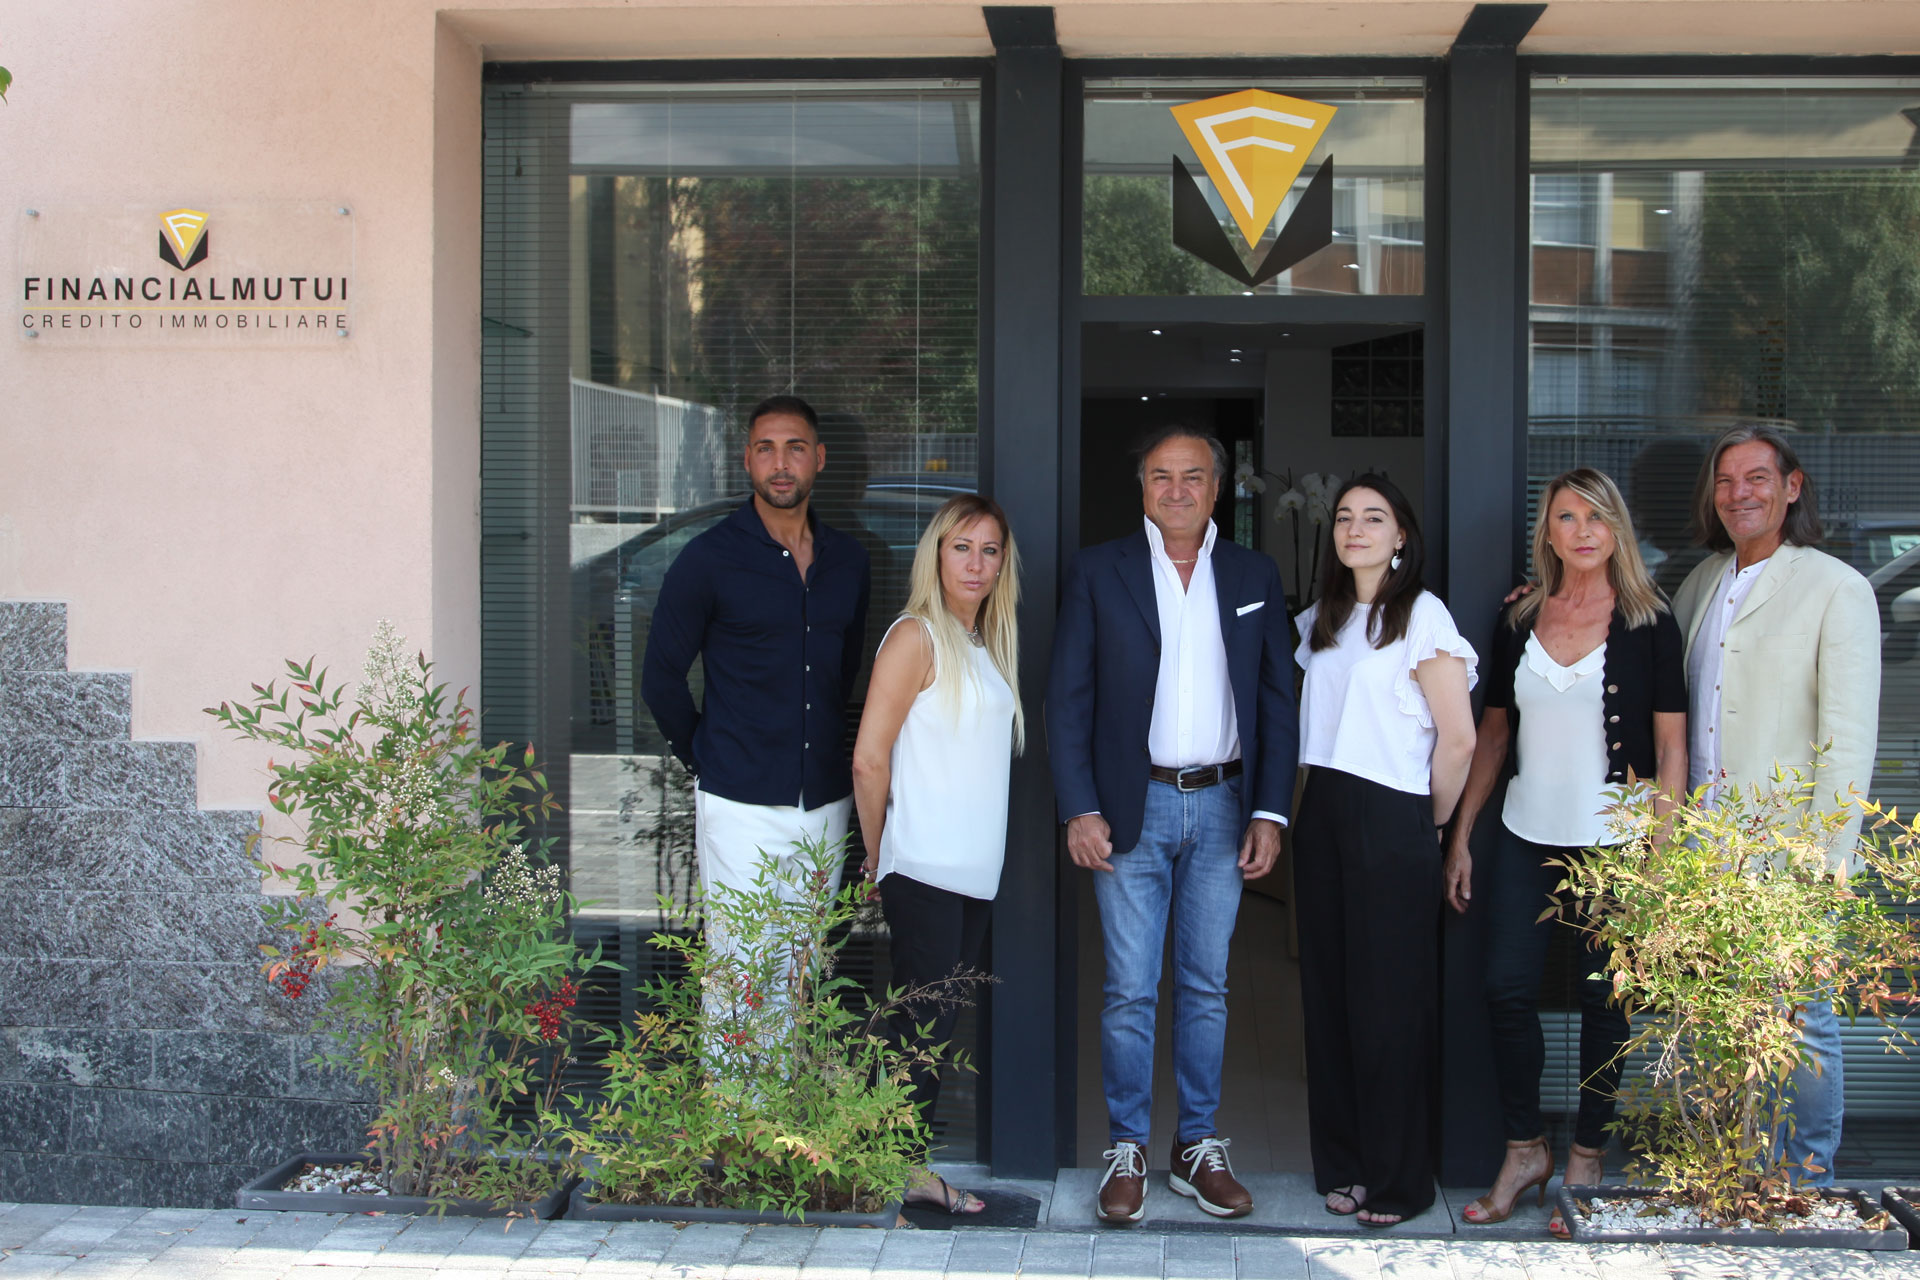 financial-mutui-varese-credito-immobiliare-foto-team-nuova-1-©-2021-luisa-papa-aimaproject-sa